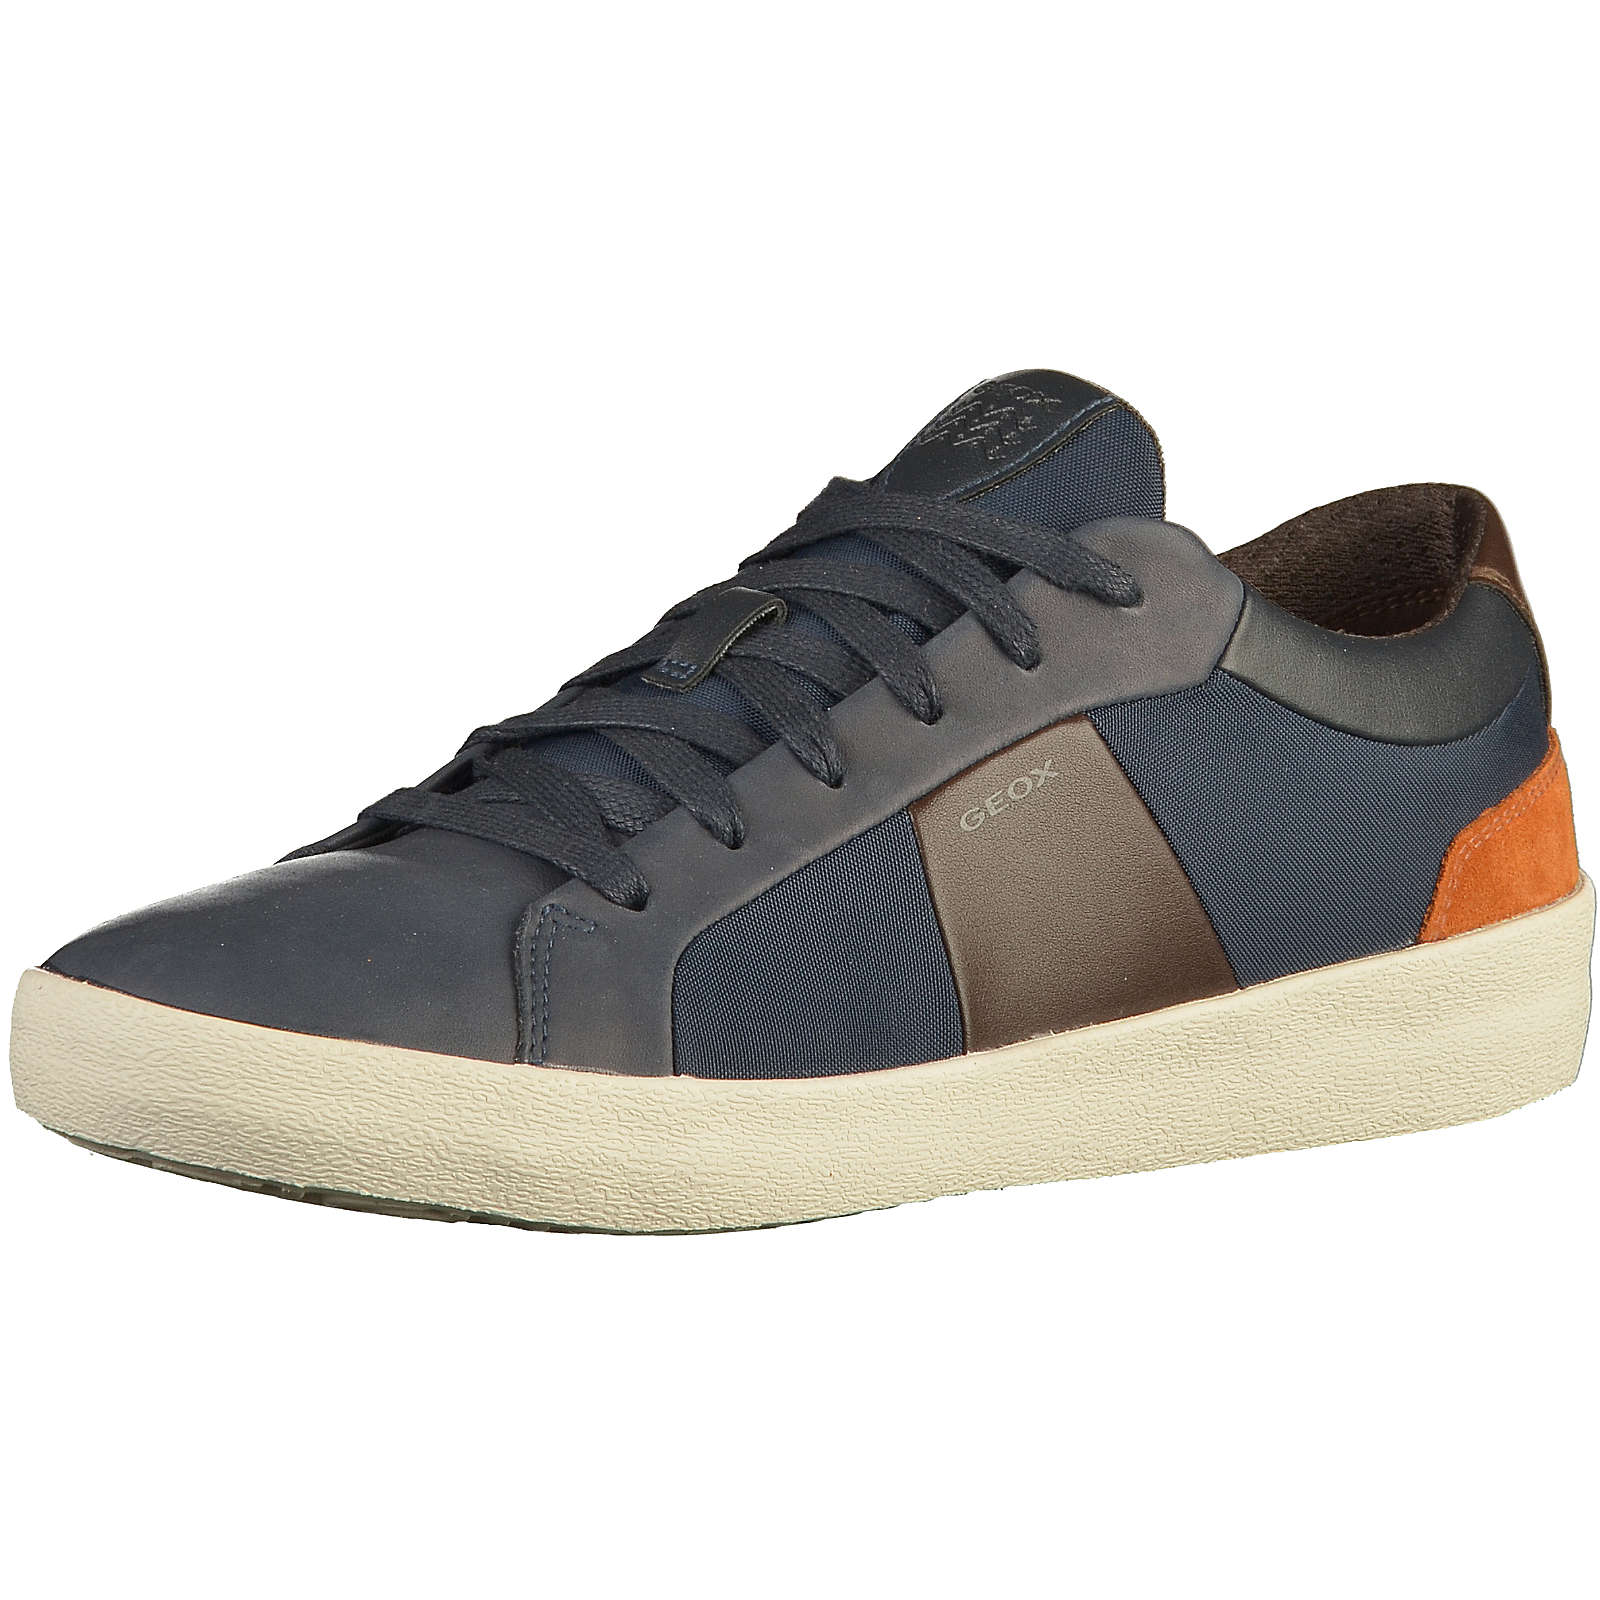 GEOX Sneaker Sneakers Low dunkelblau Herren Gr. 41